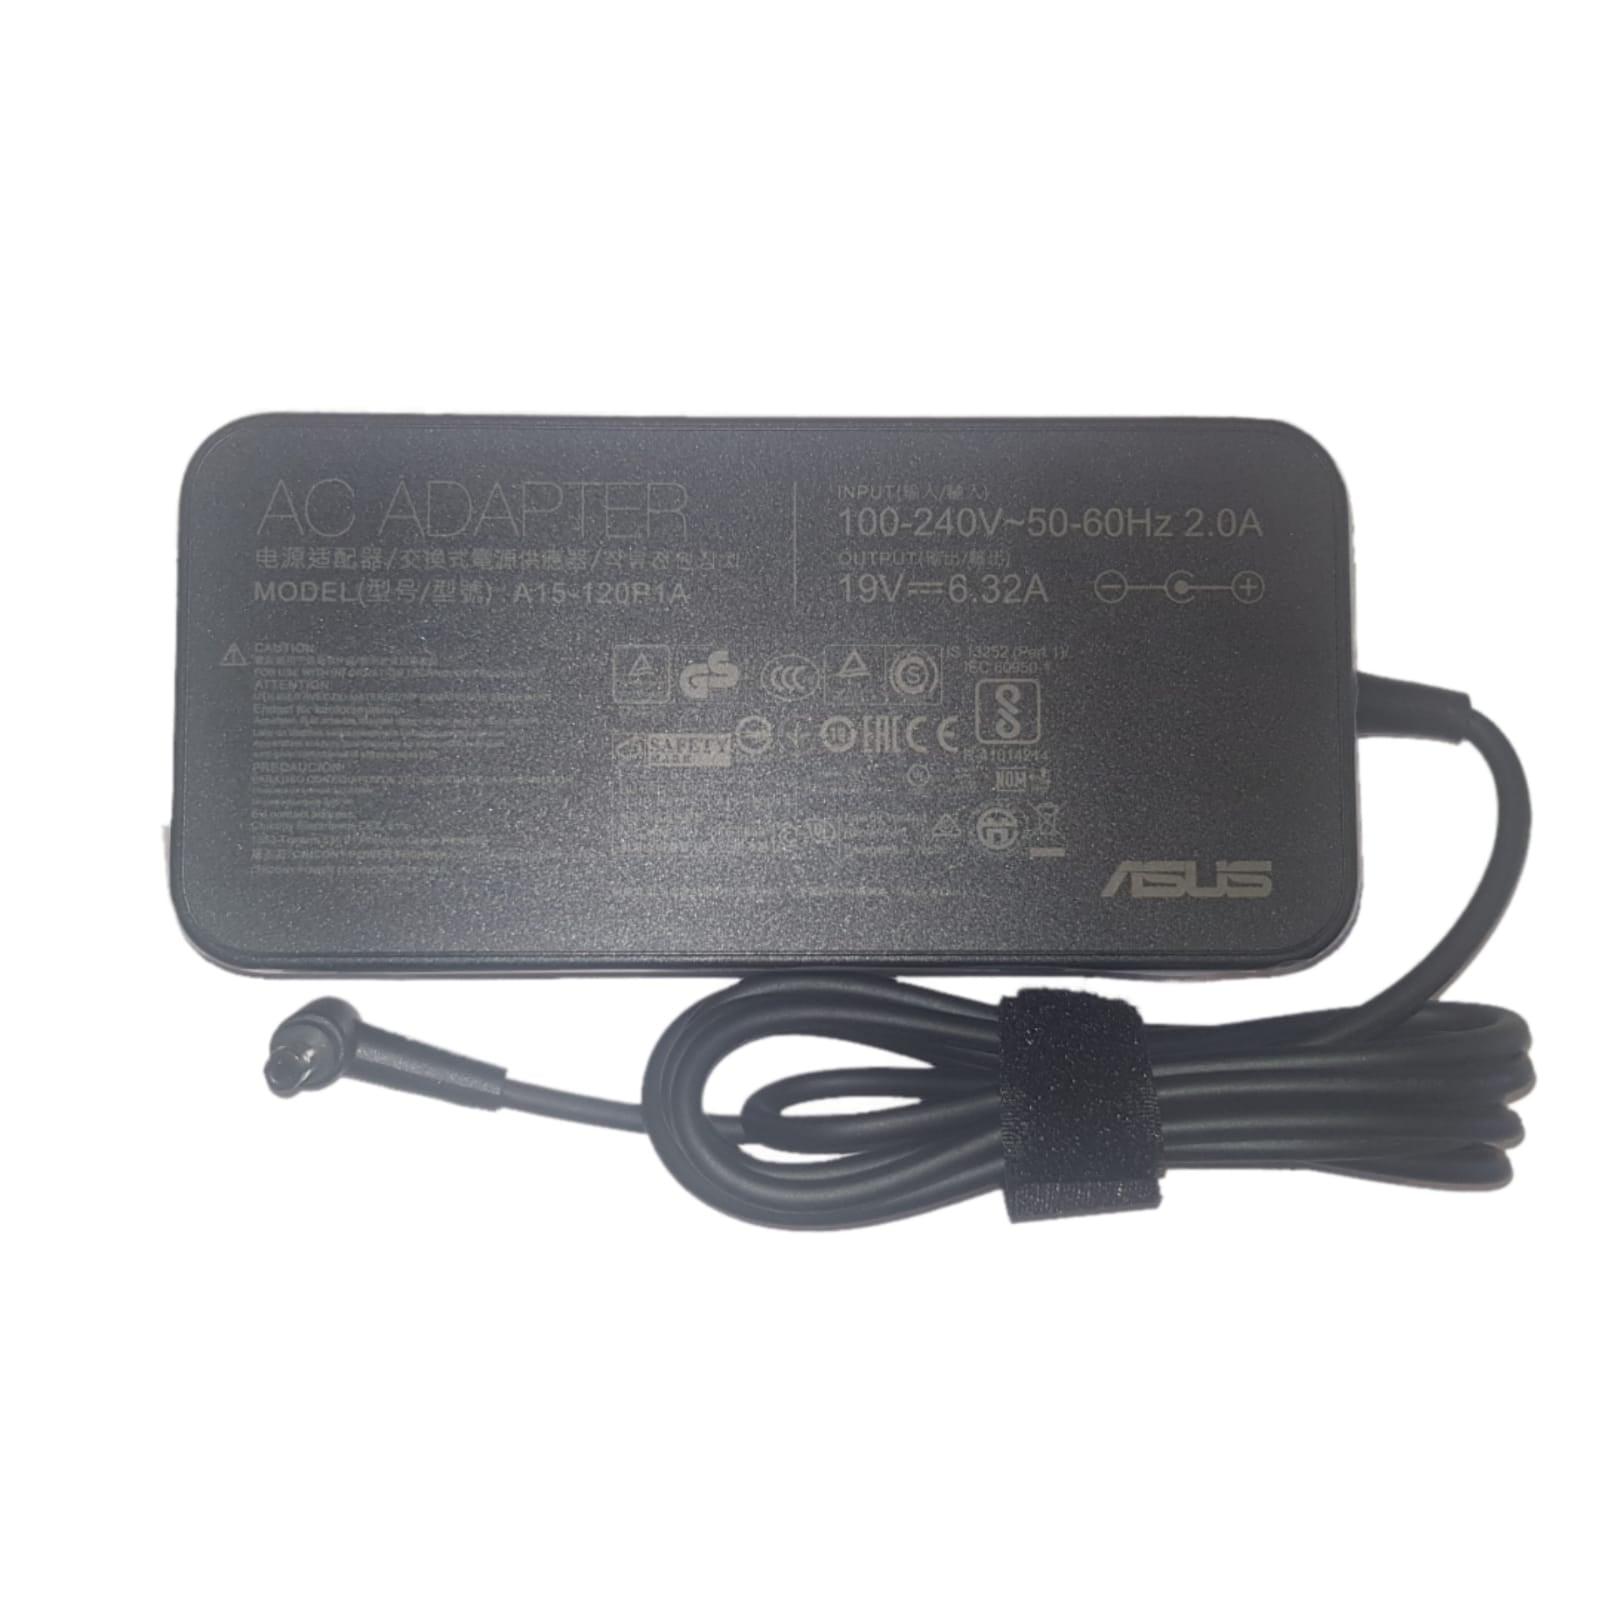 מטען למחשב נייד אסוס Asus N46VZ